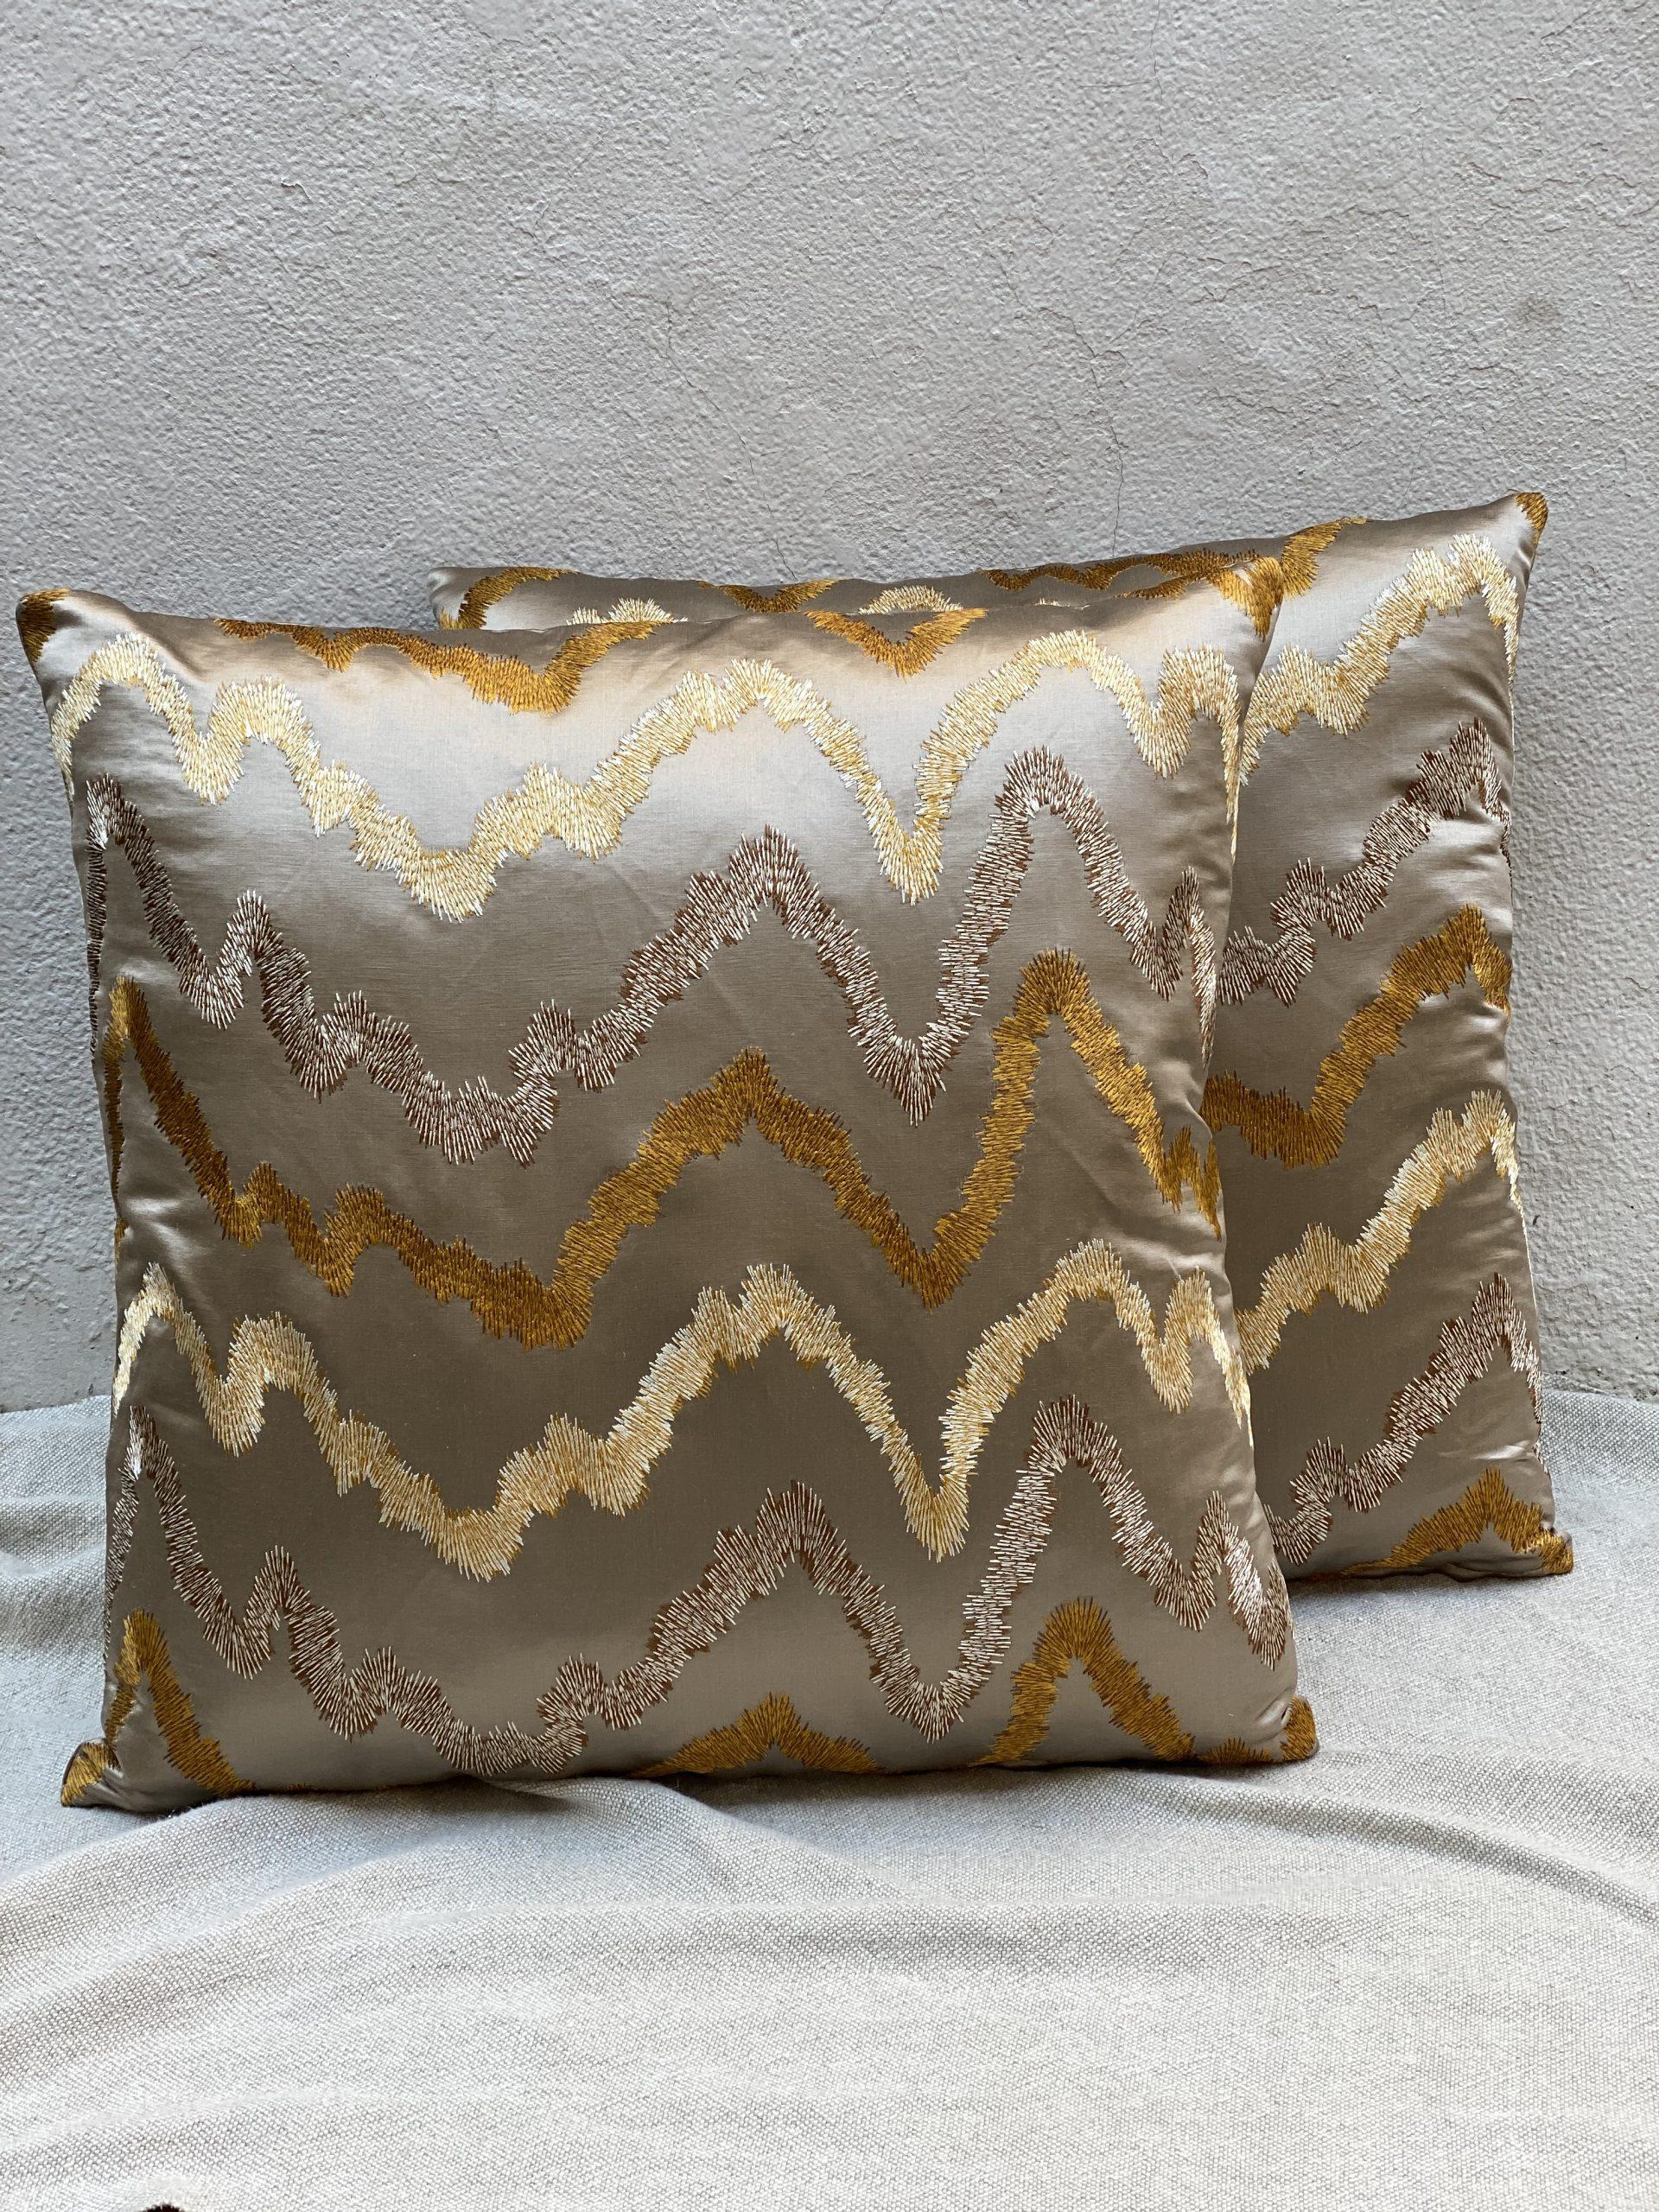 Donghia Pillows